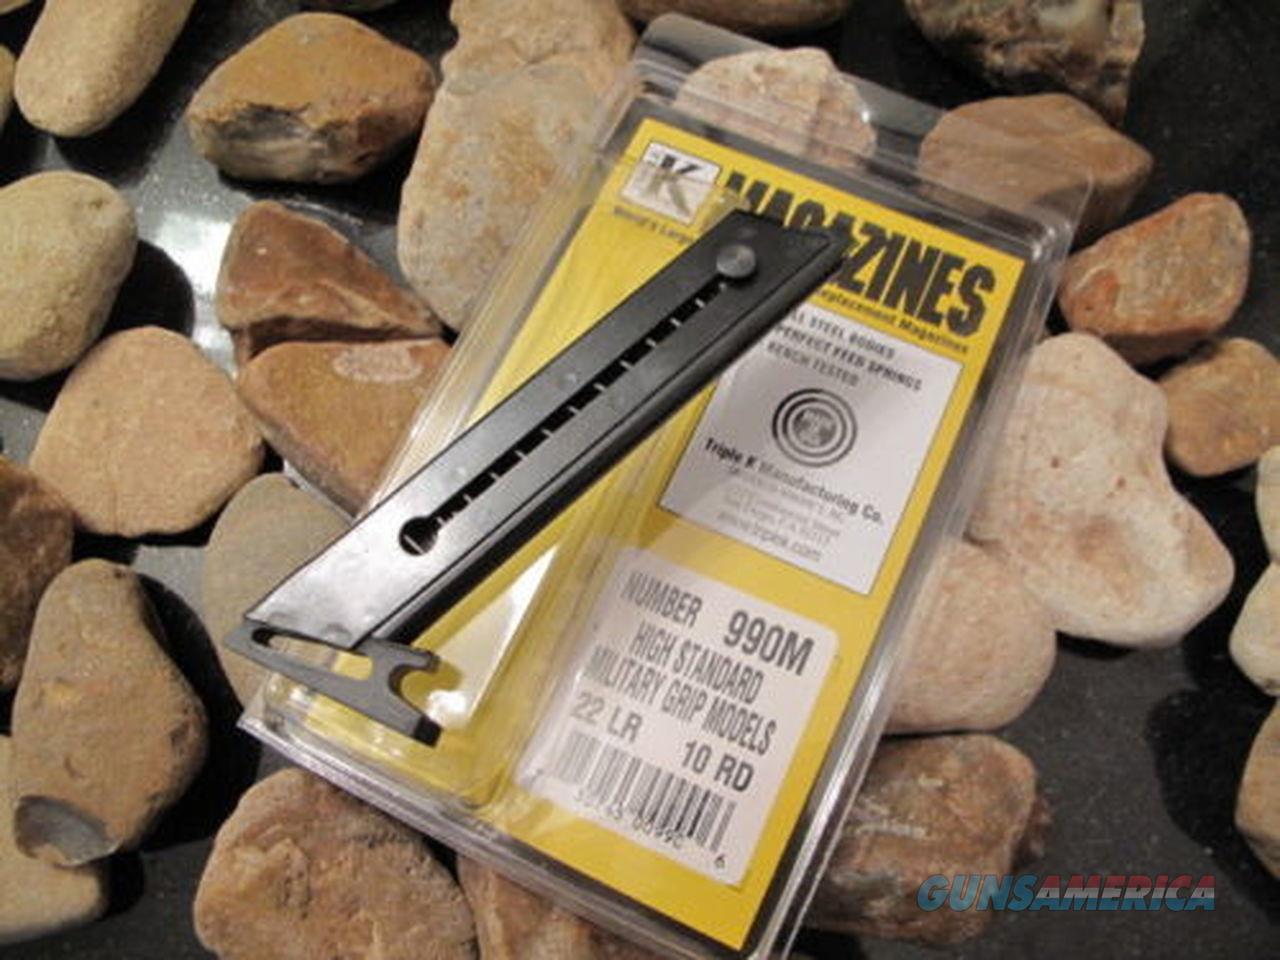 1 SINGLE Fits High Standard MILITARY GRIP MAGAZINE Mags US MADE 22LR 10 Rd 22  Non-Guns > Ammunition